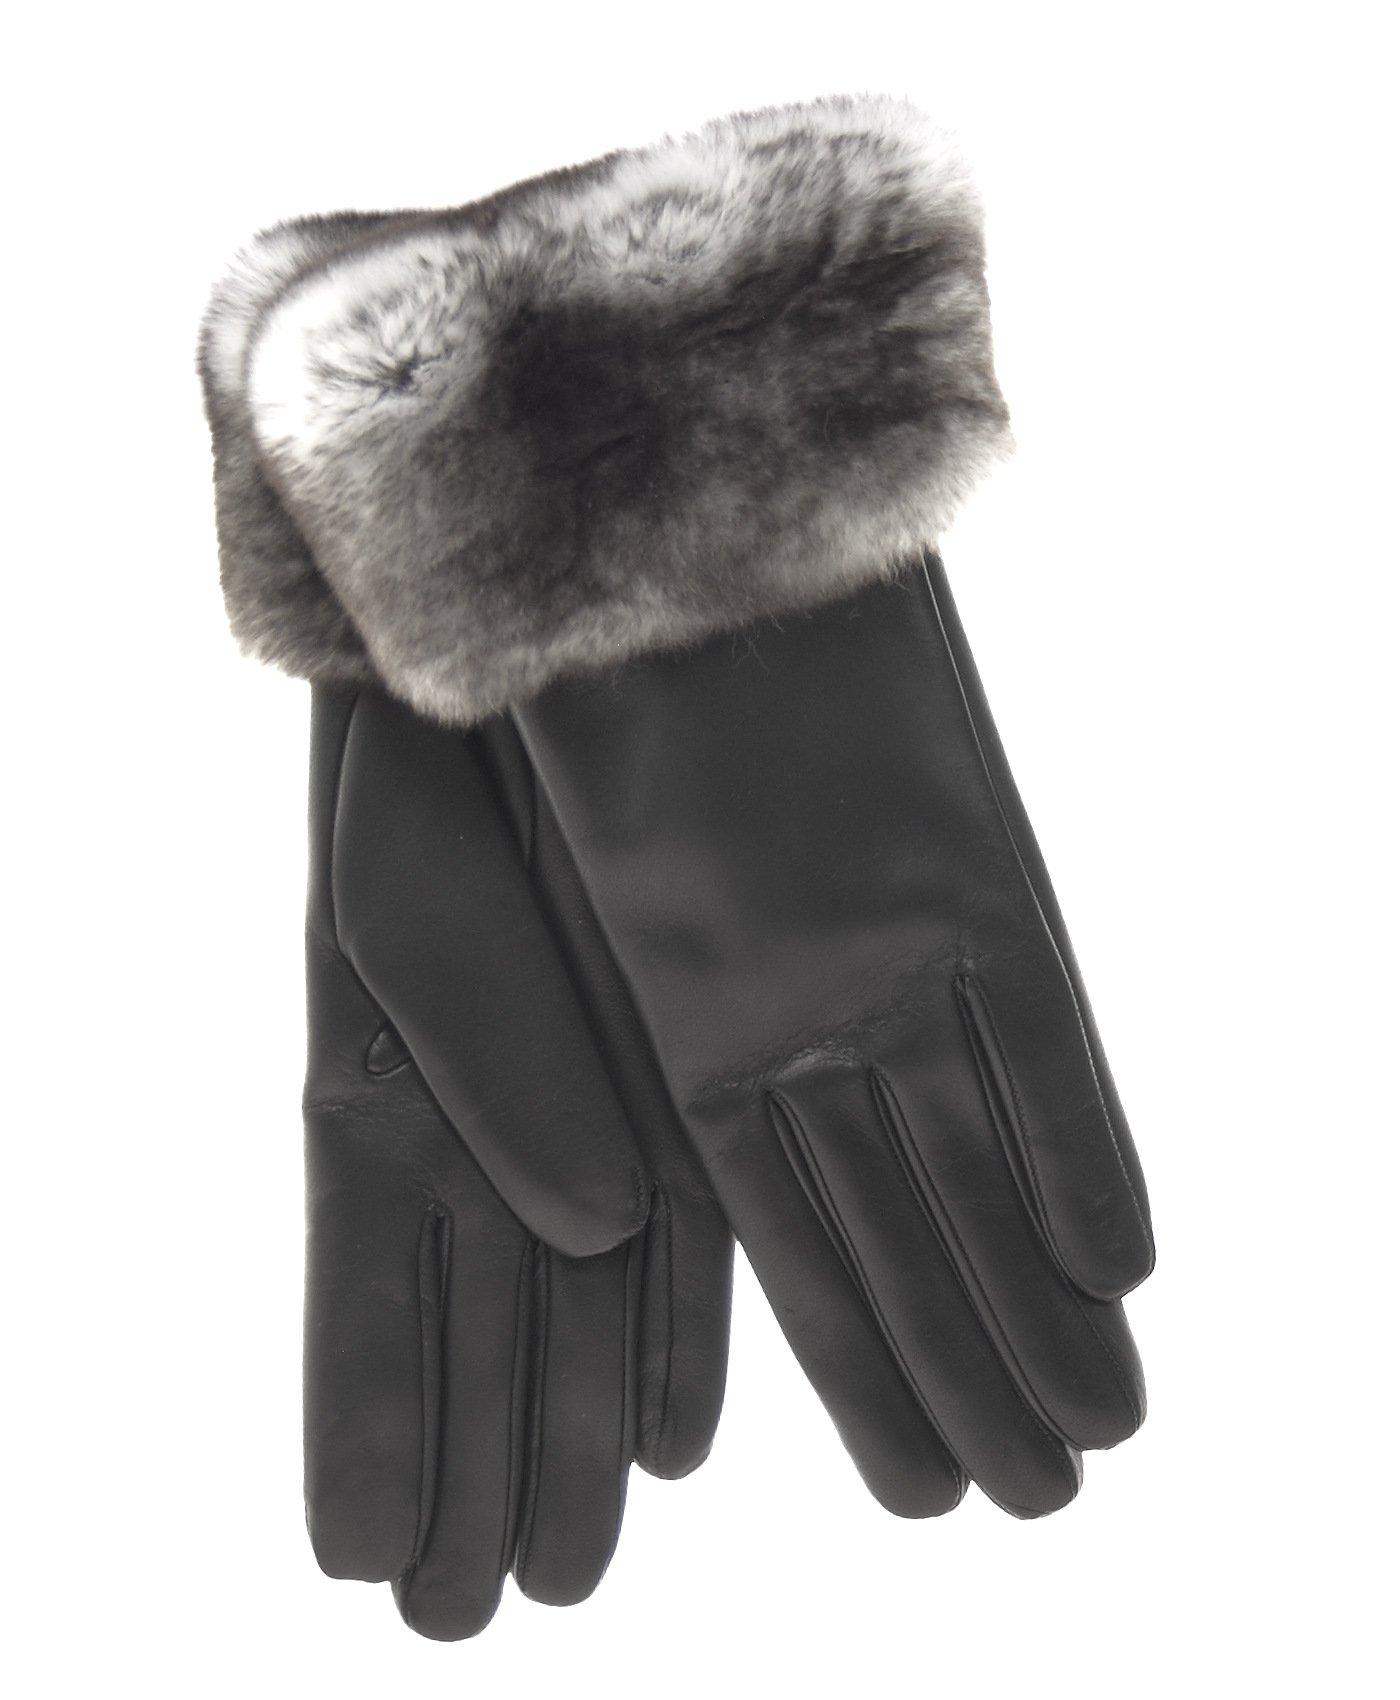 Fratelli Orsini Women's Italian Orylag Rabbit Fur Cuff Cashmere Lined Winter Leather Gloves Size 8 Color Black